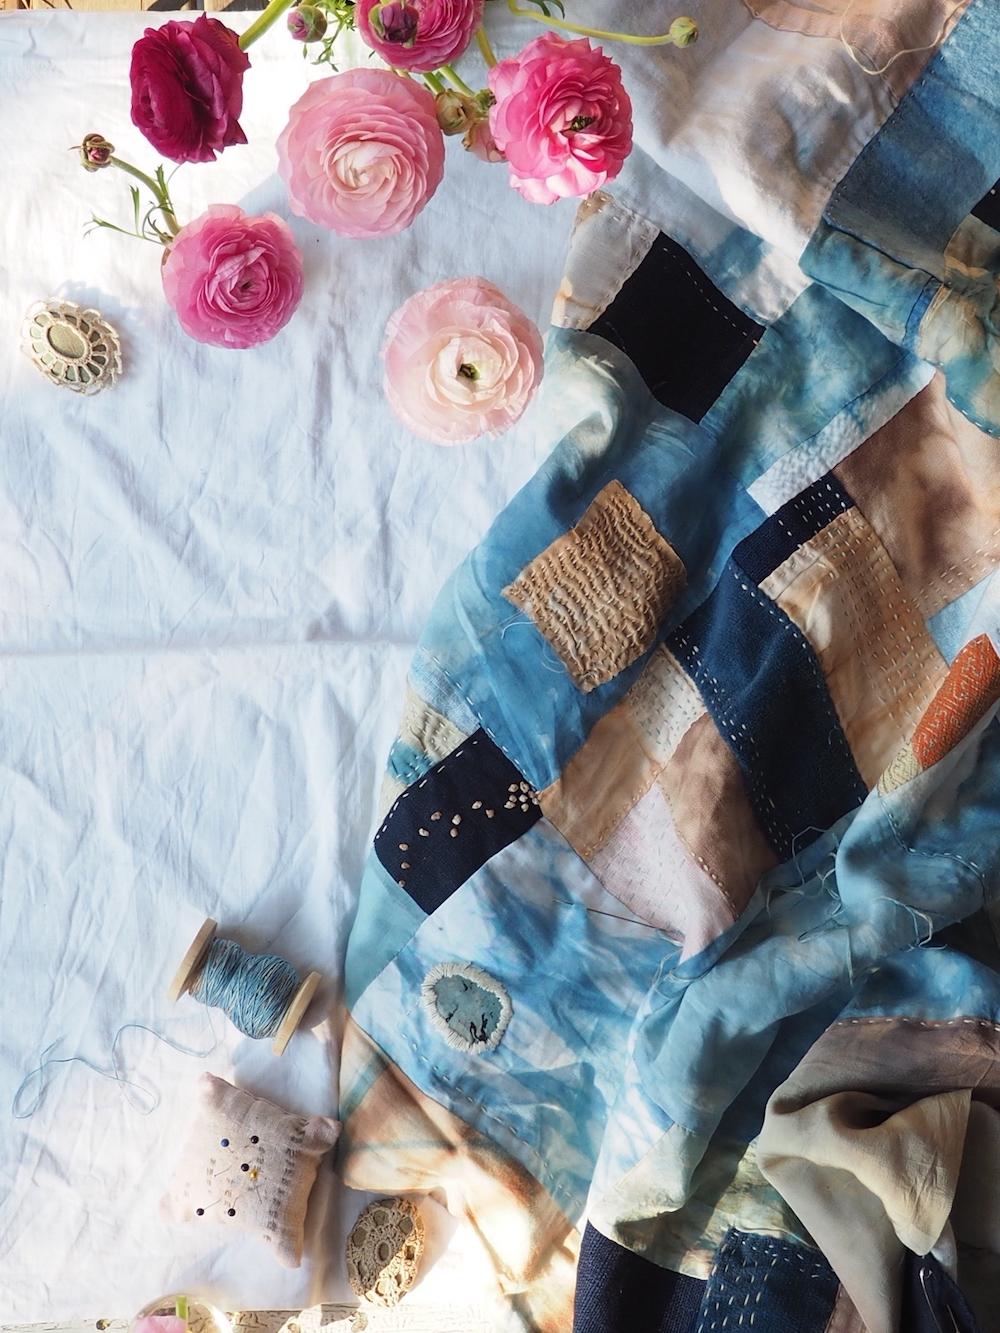 Hand dyed fabric hand stitched quilt. Naturally and botanically dyed, kimono fabric, hemp, silk, cotton, linen. Sashiko, boro, kantha. Slow Stitch, Mindful Mending. The Fearless Quilt by Ellie Beck Petalplum.jpeg